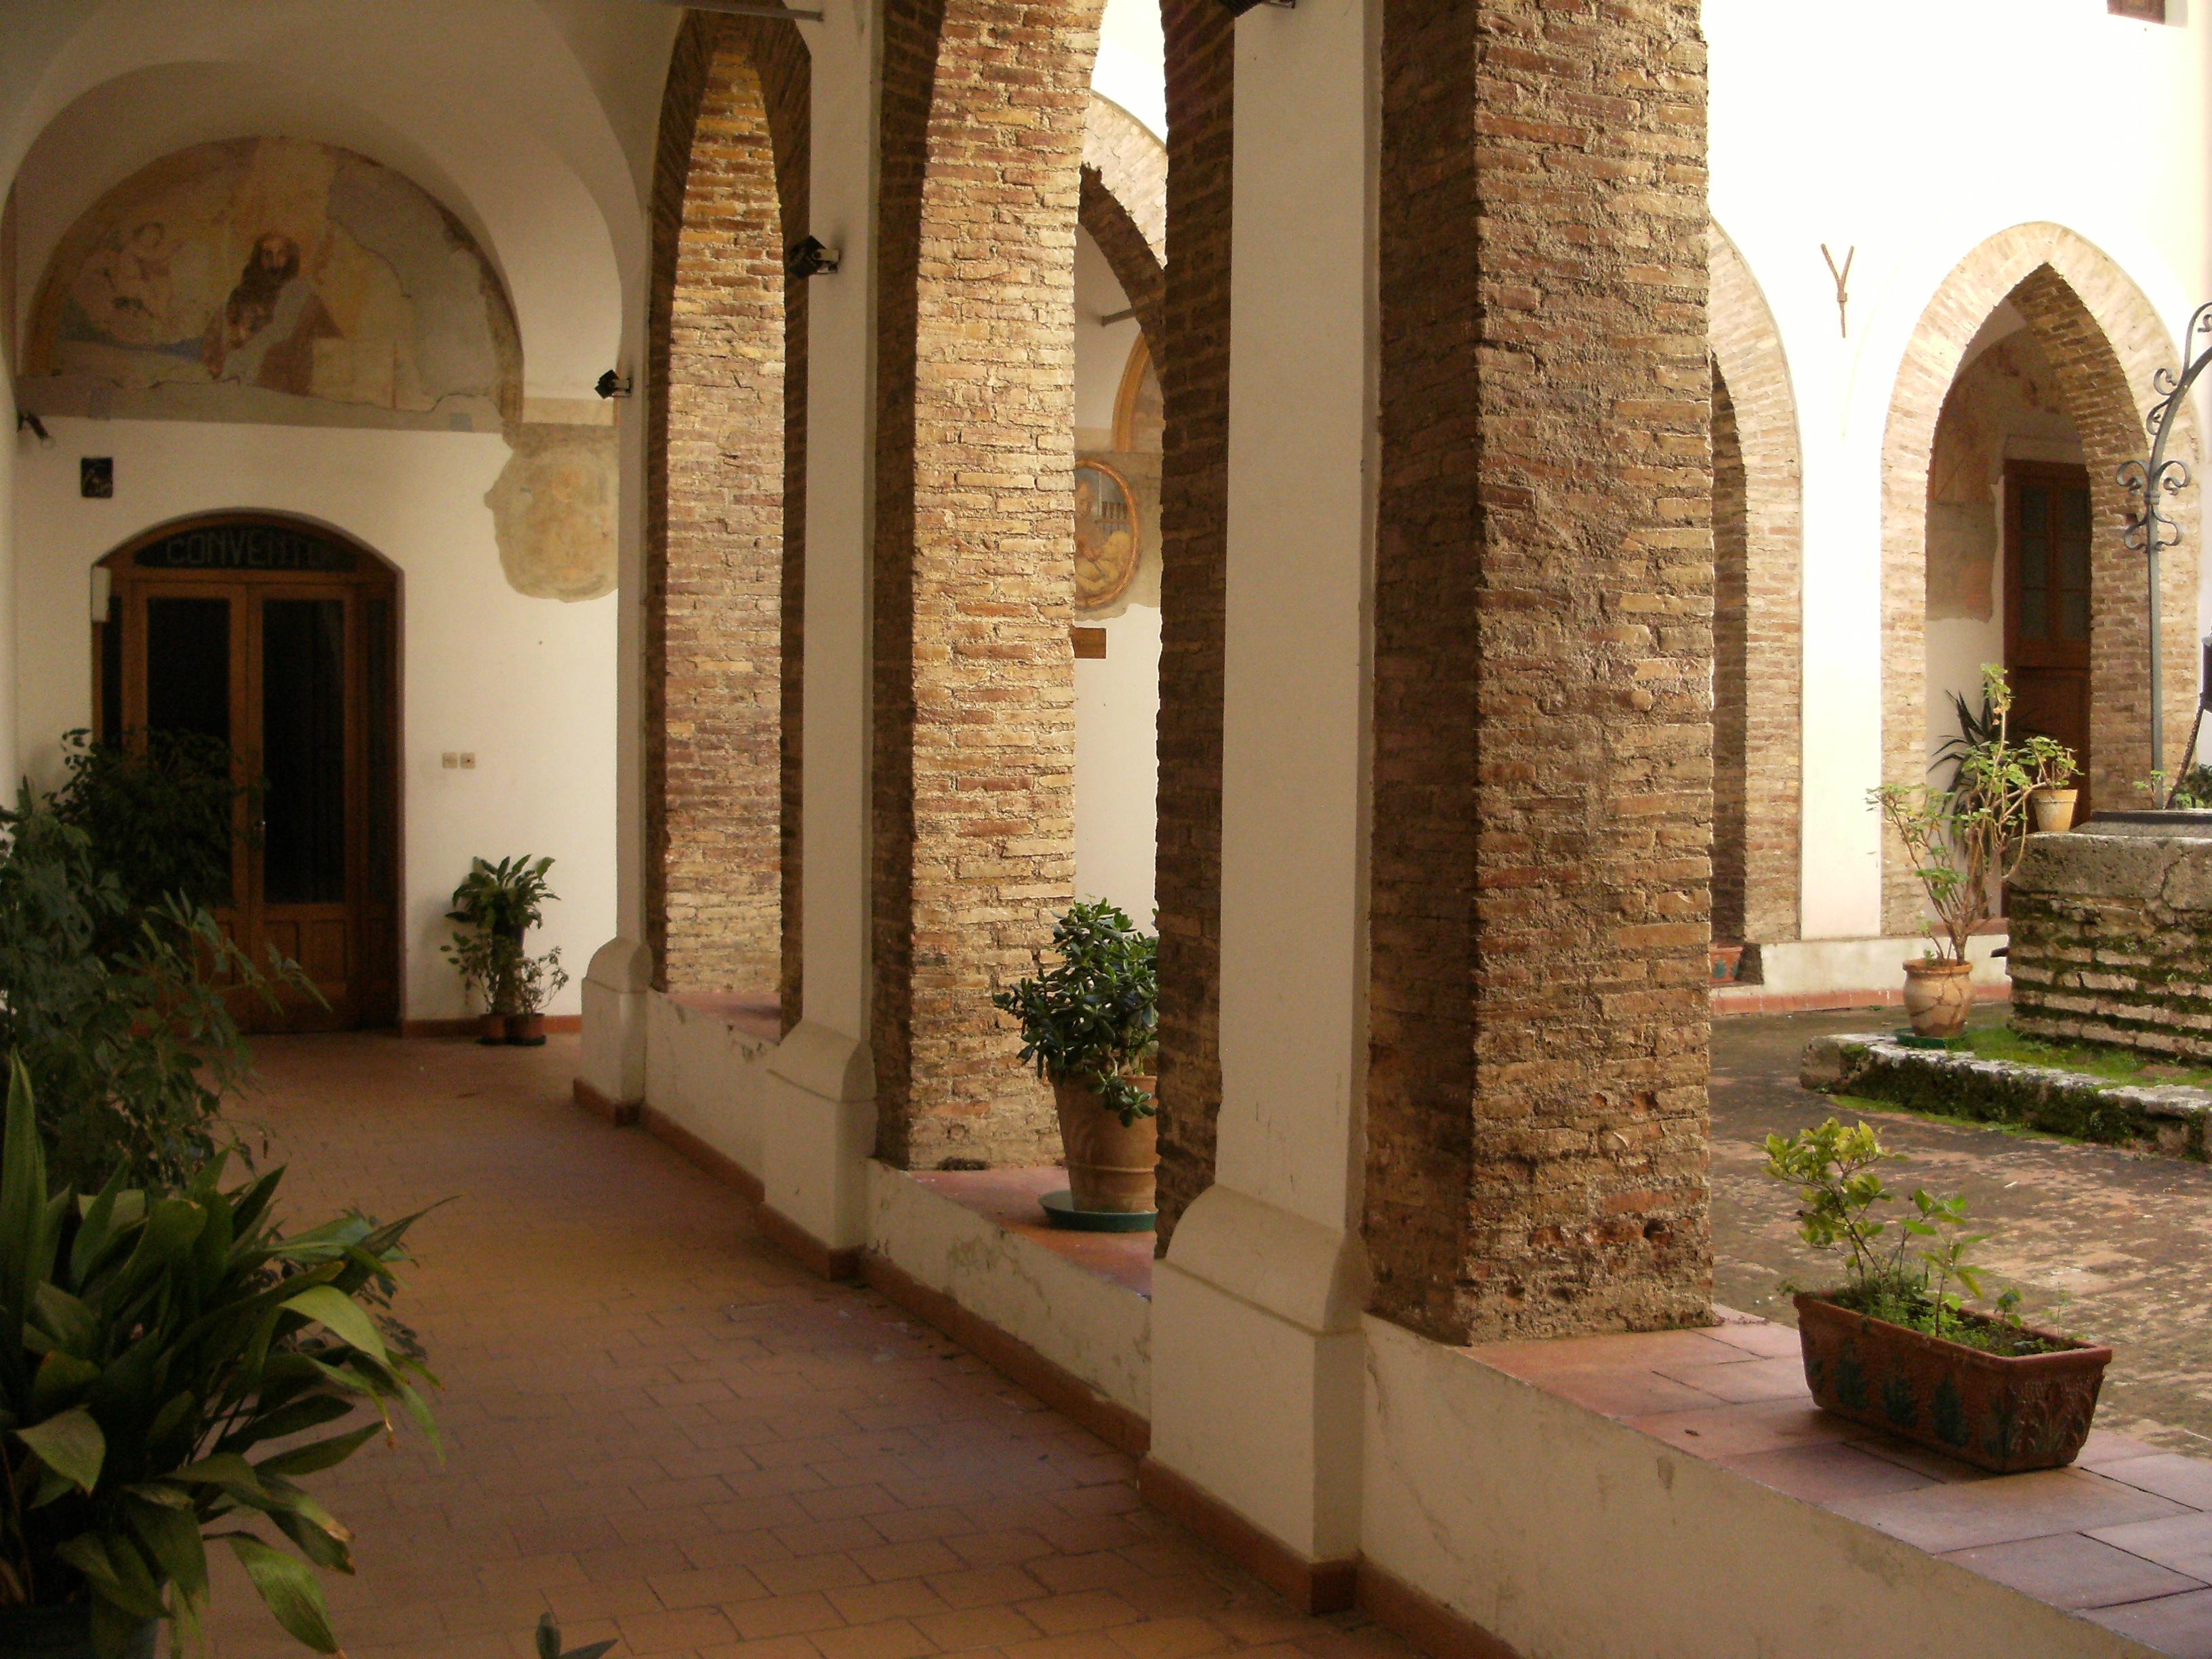 Calvaruso: Convento e Santuario Ecce Homo